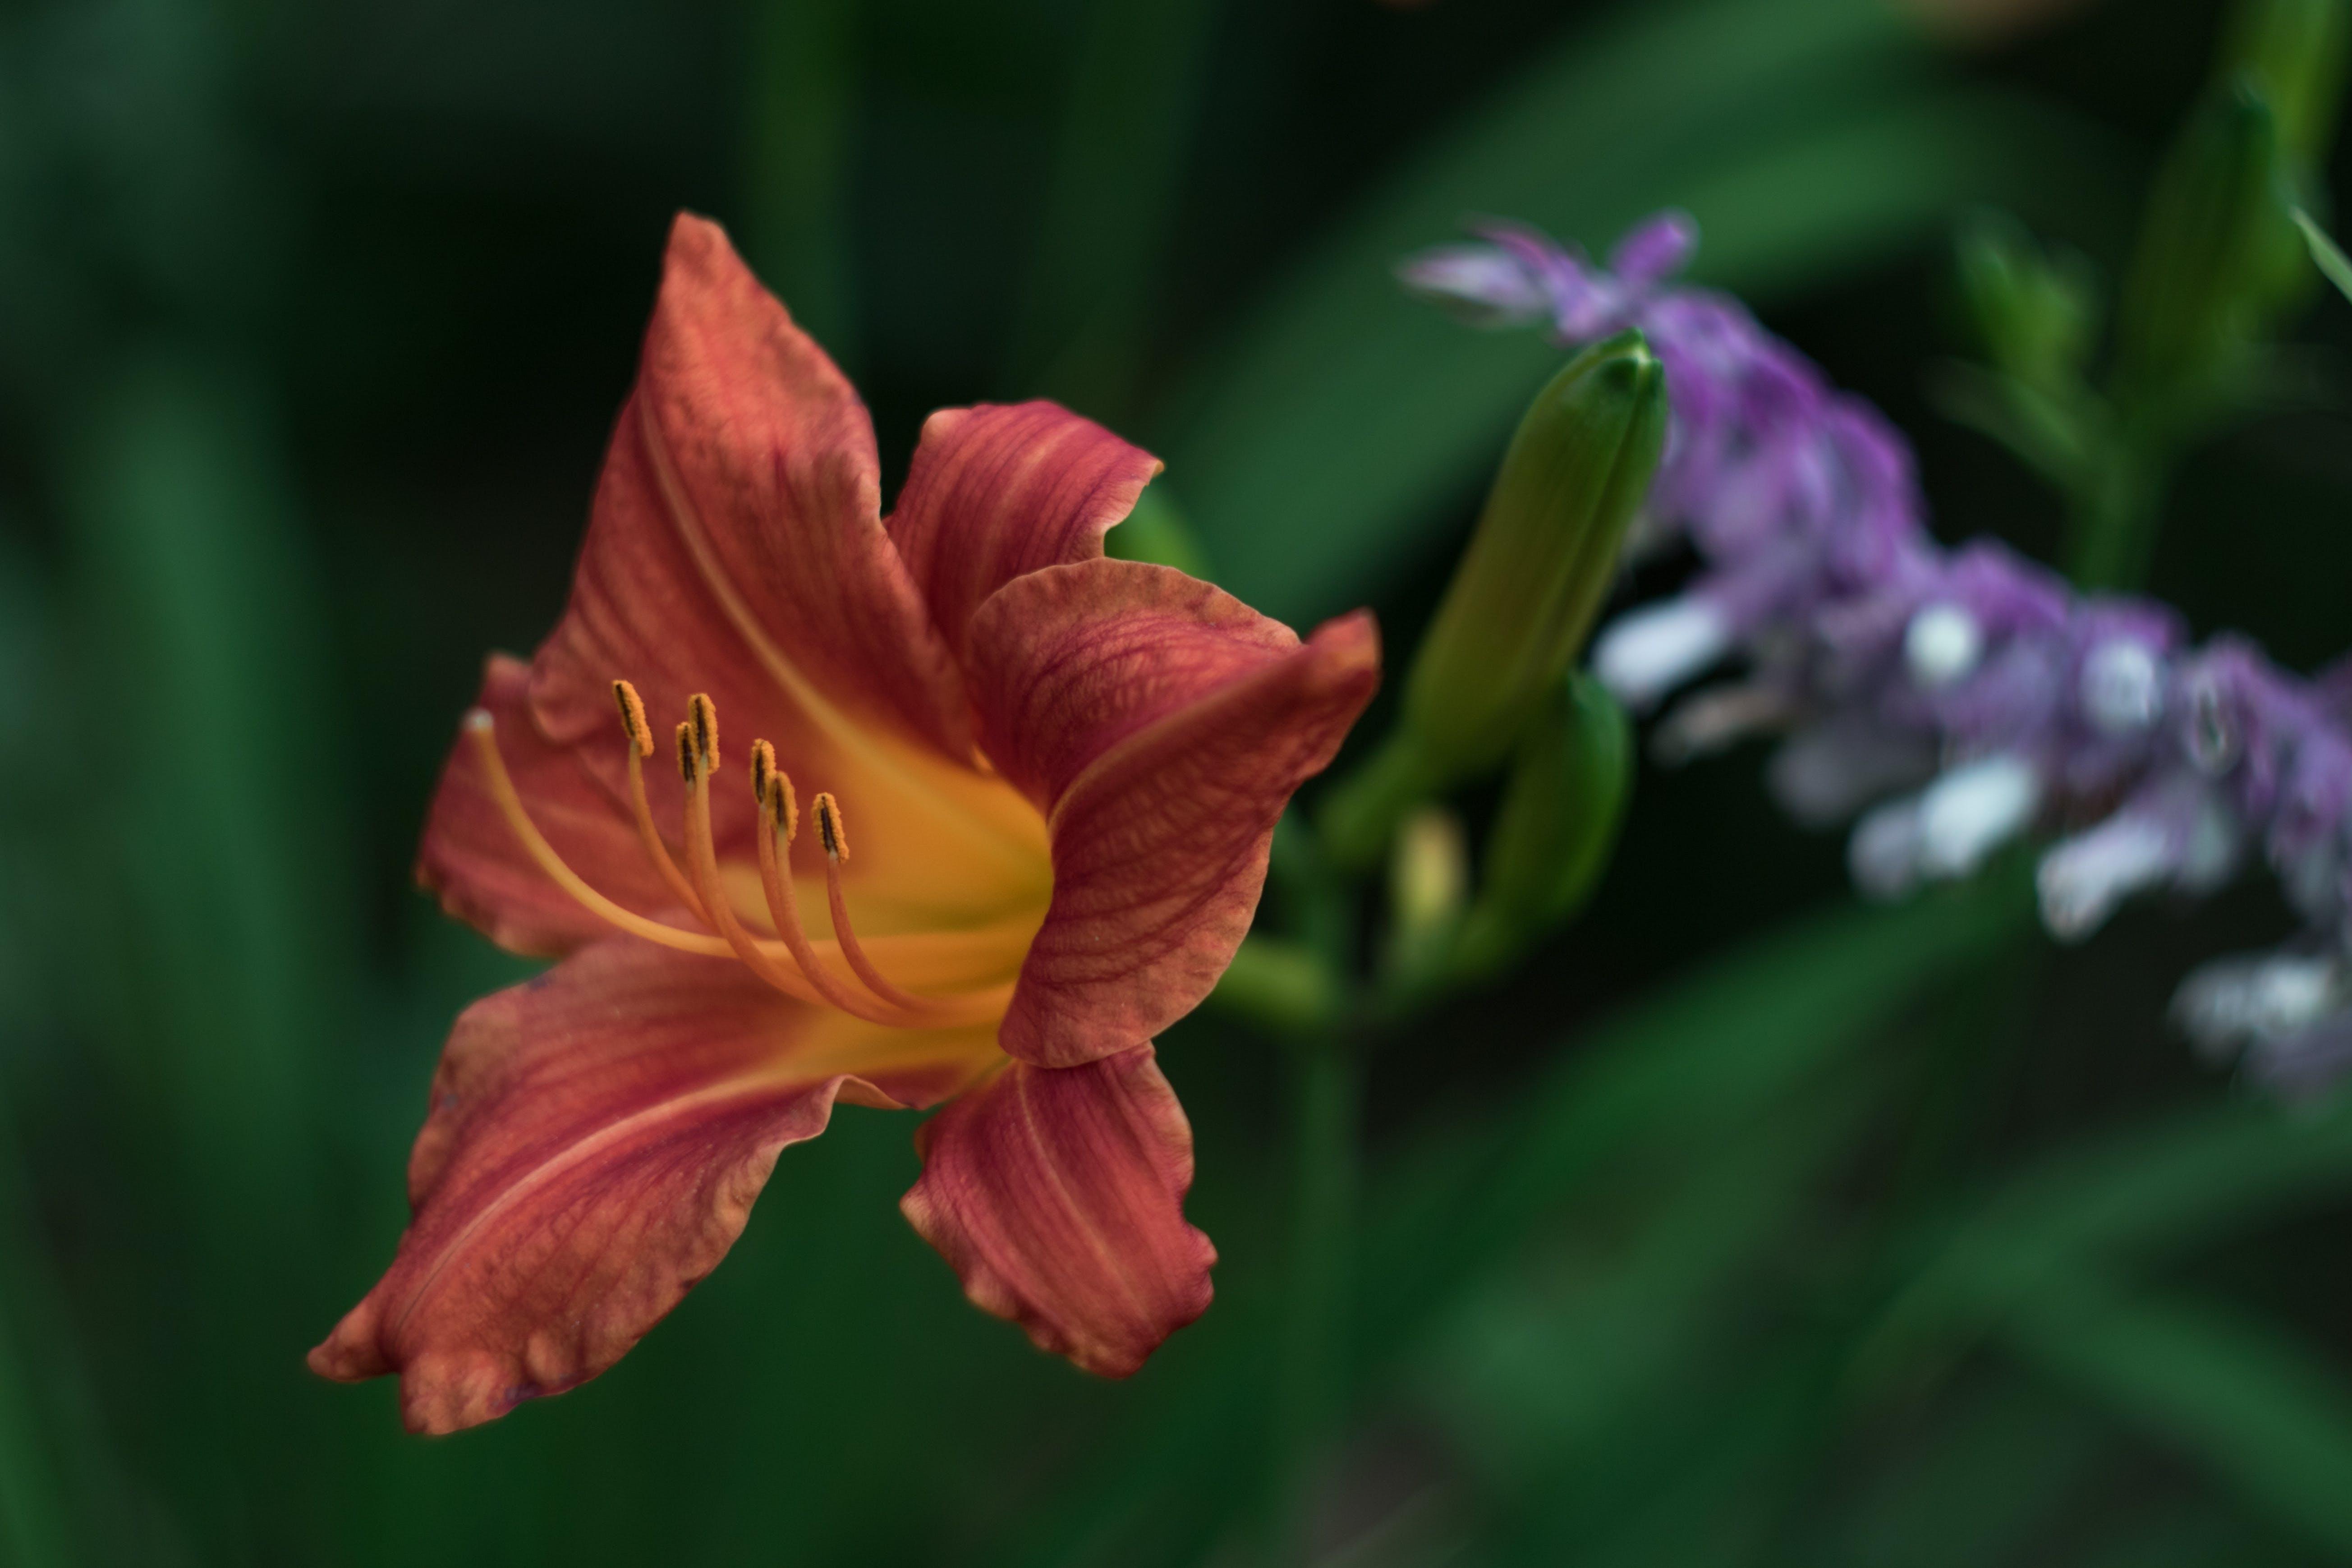 Free stock photo of beautiful flowers, blurred background, depth of field, flower garden